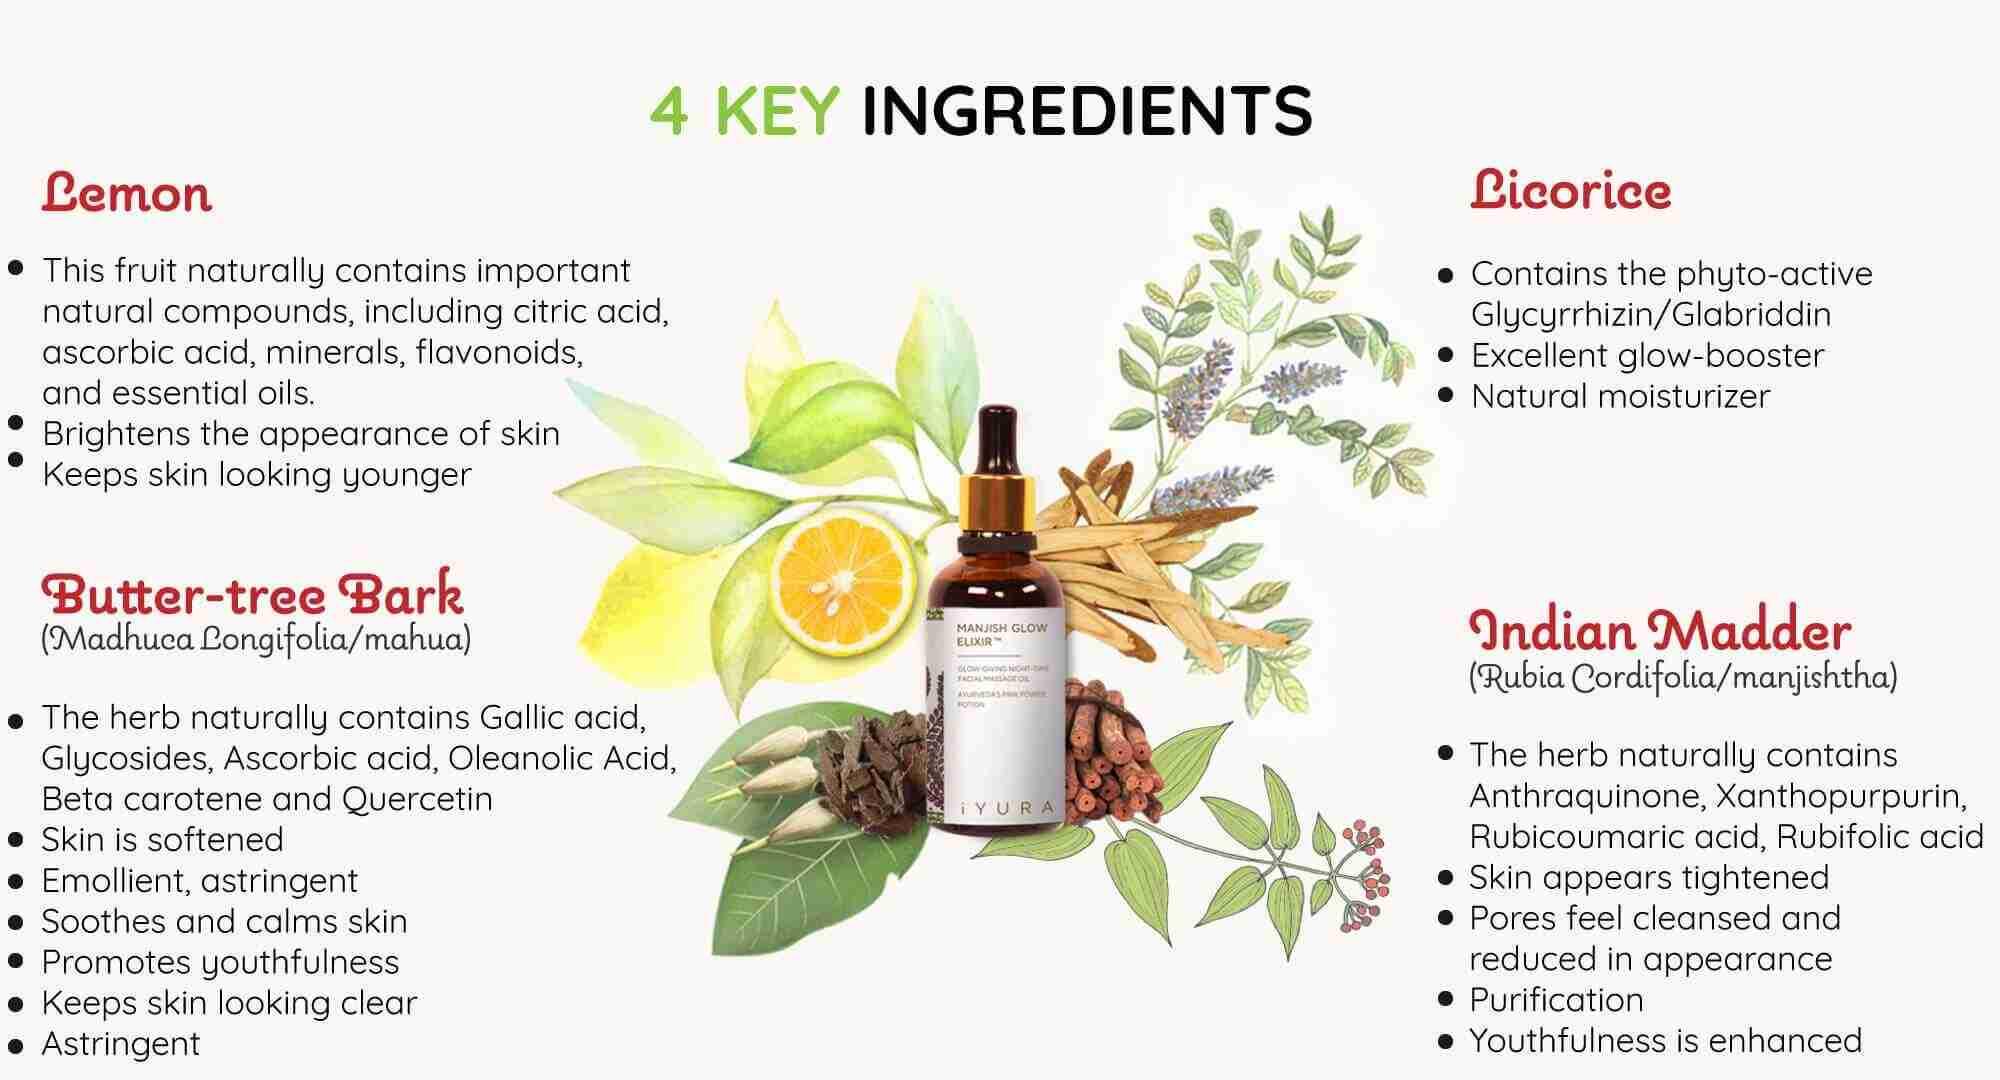 4 Key Ingredients explained: Lemon, Licorice, Butter-tree Bark, Indian Madder